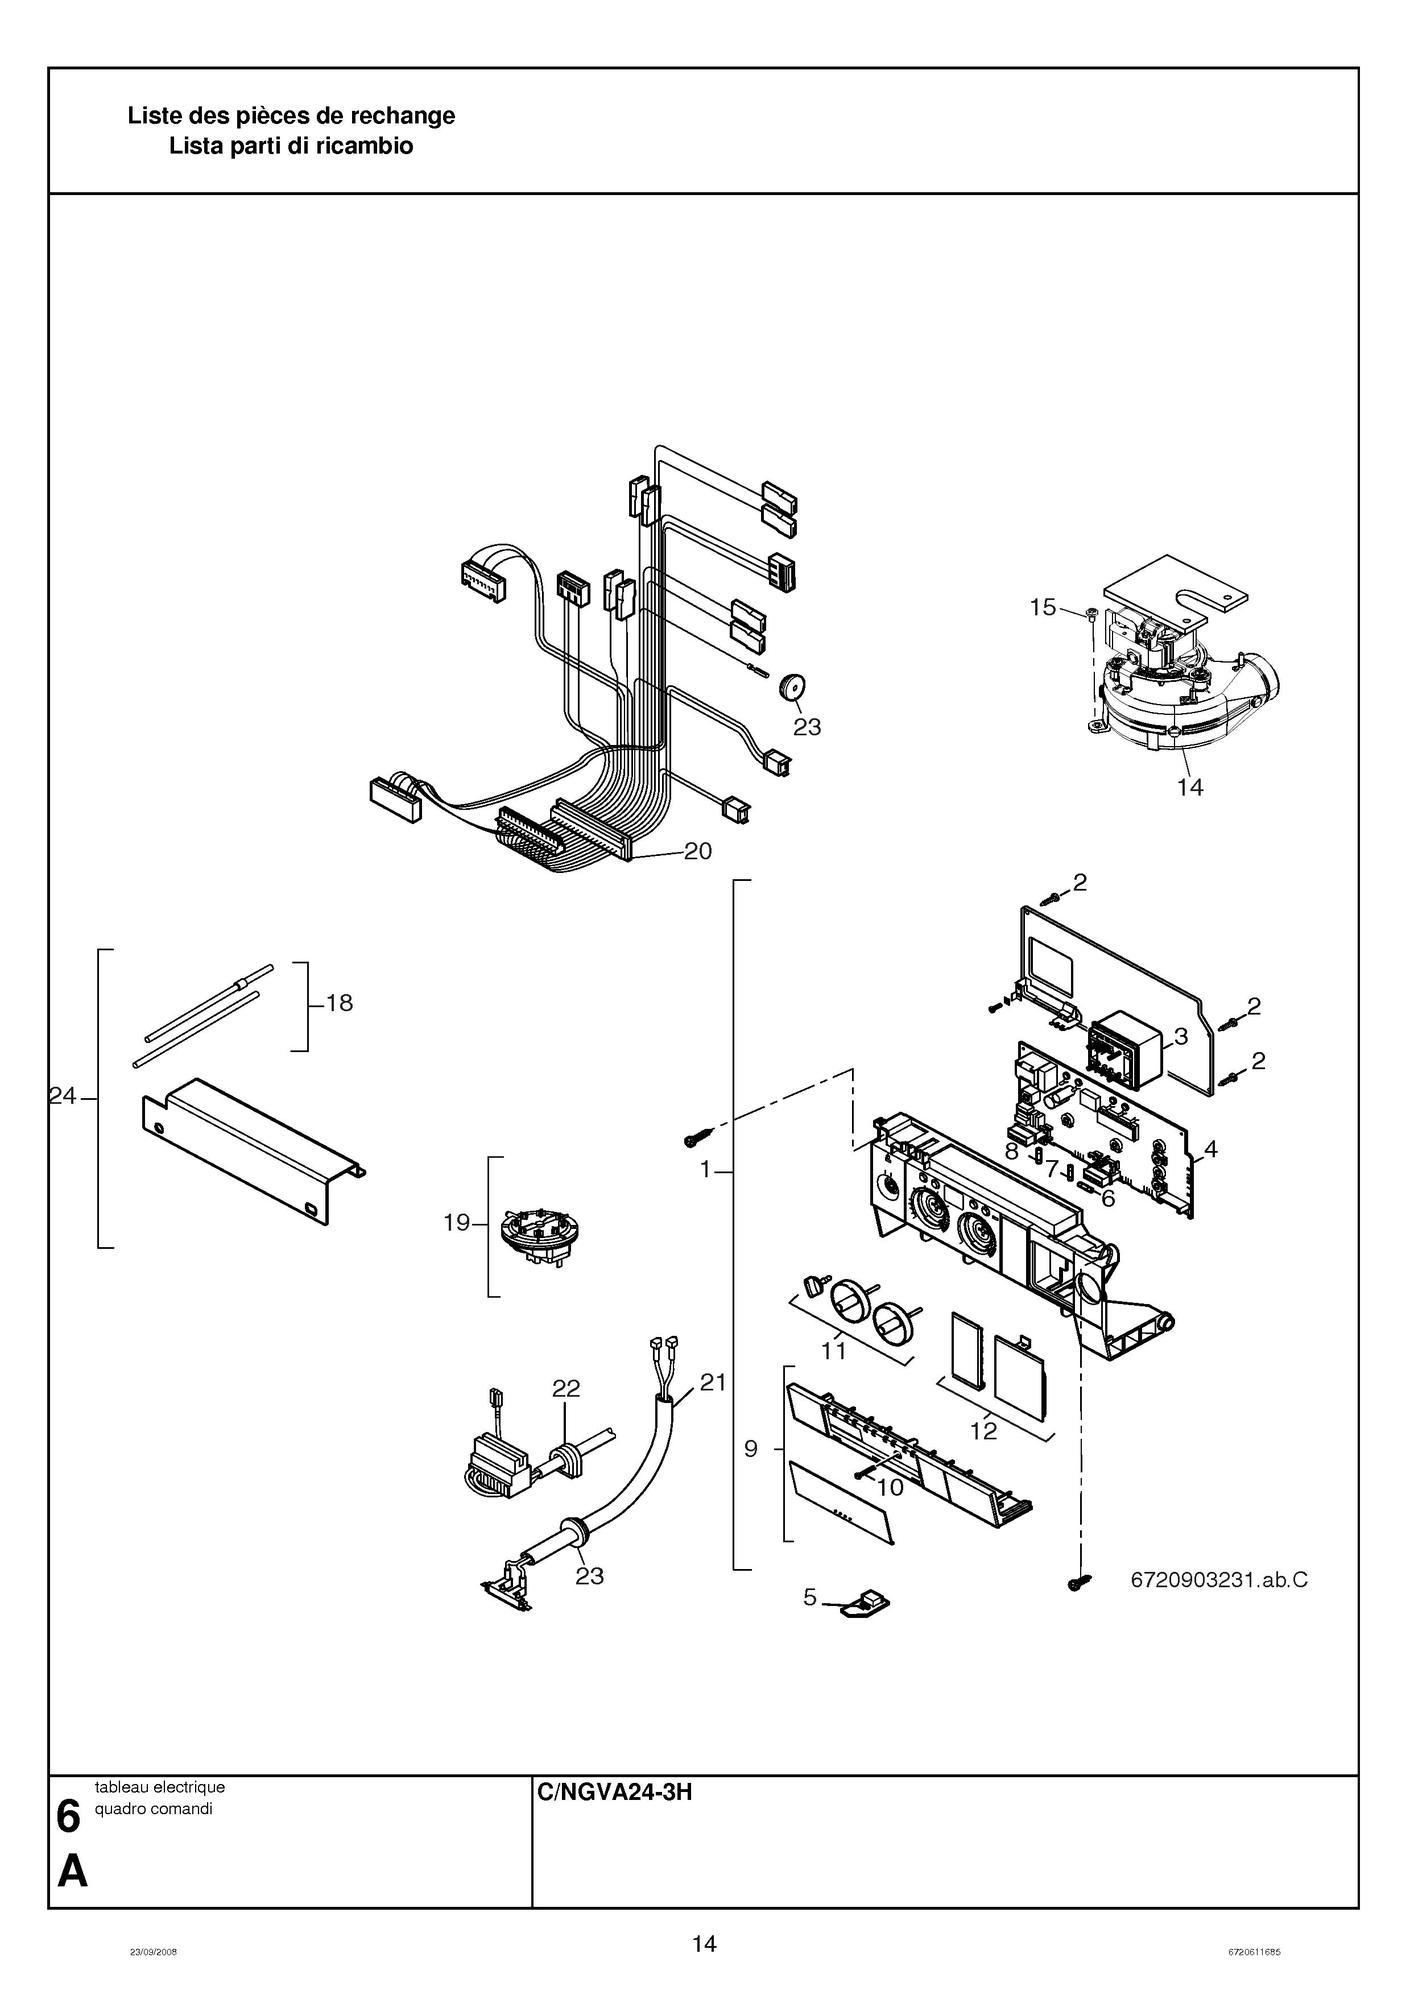 recherche directe dans la vue clat e de l 39 article elm leblanc ci codage ngva gvs 24 3hn. Black Bedroom Furniture Sets. Home Design Ideas